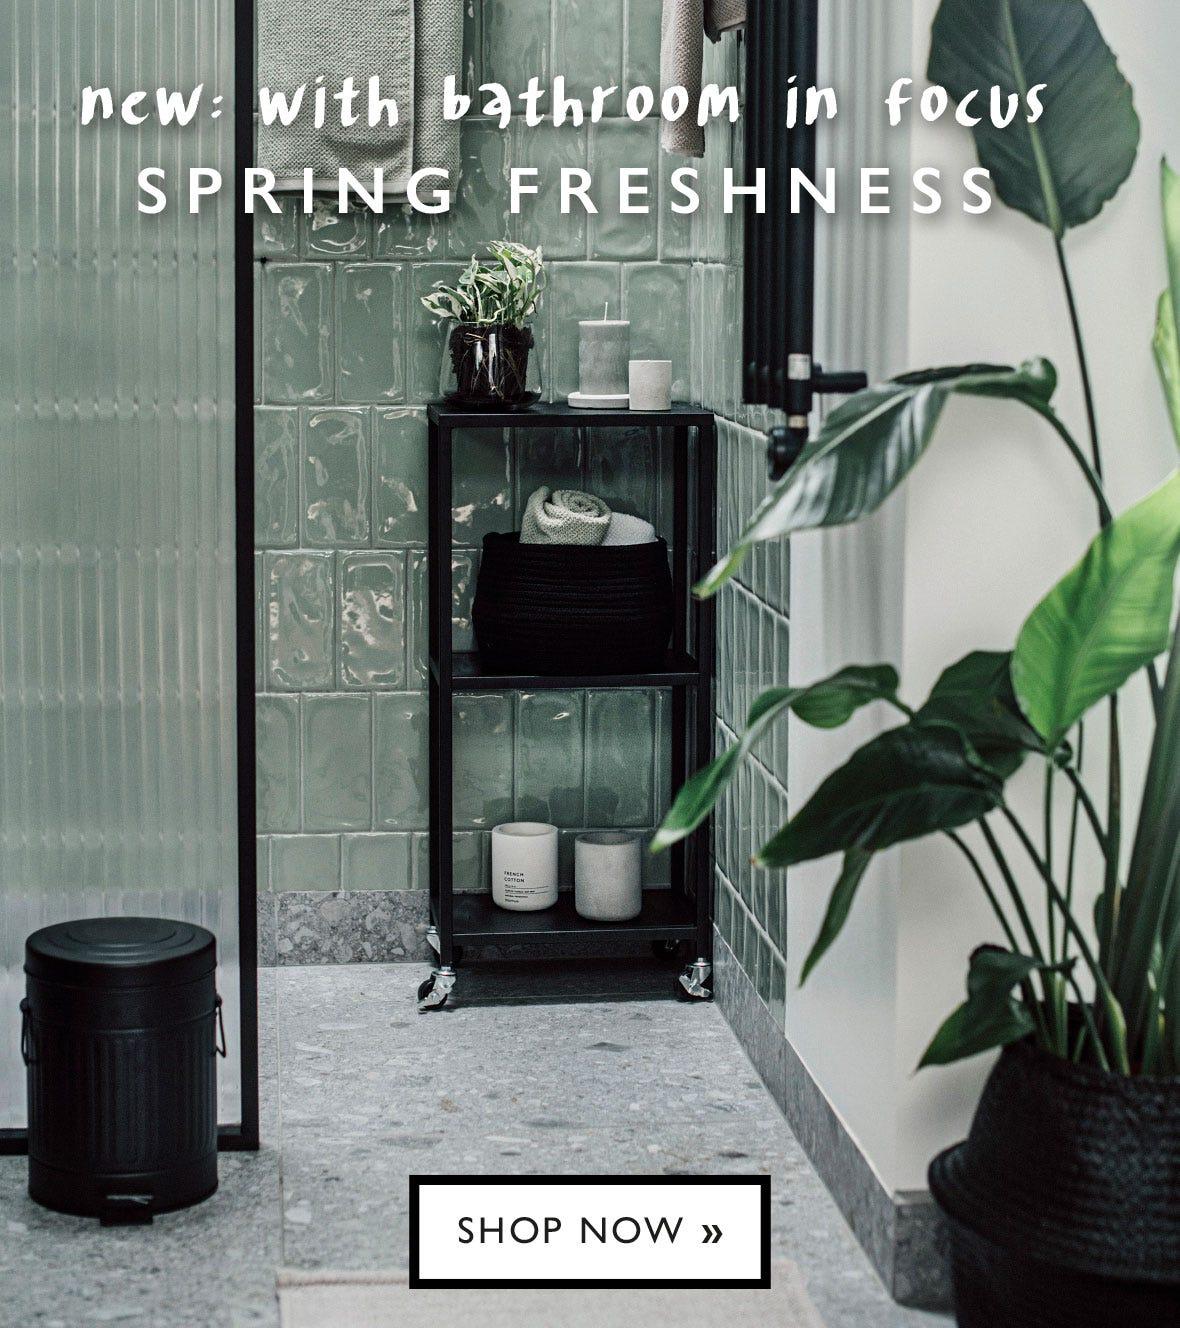 Focus on the bathroom - Spring Freshness!